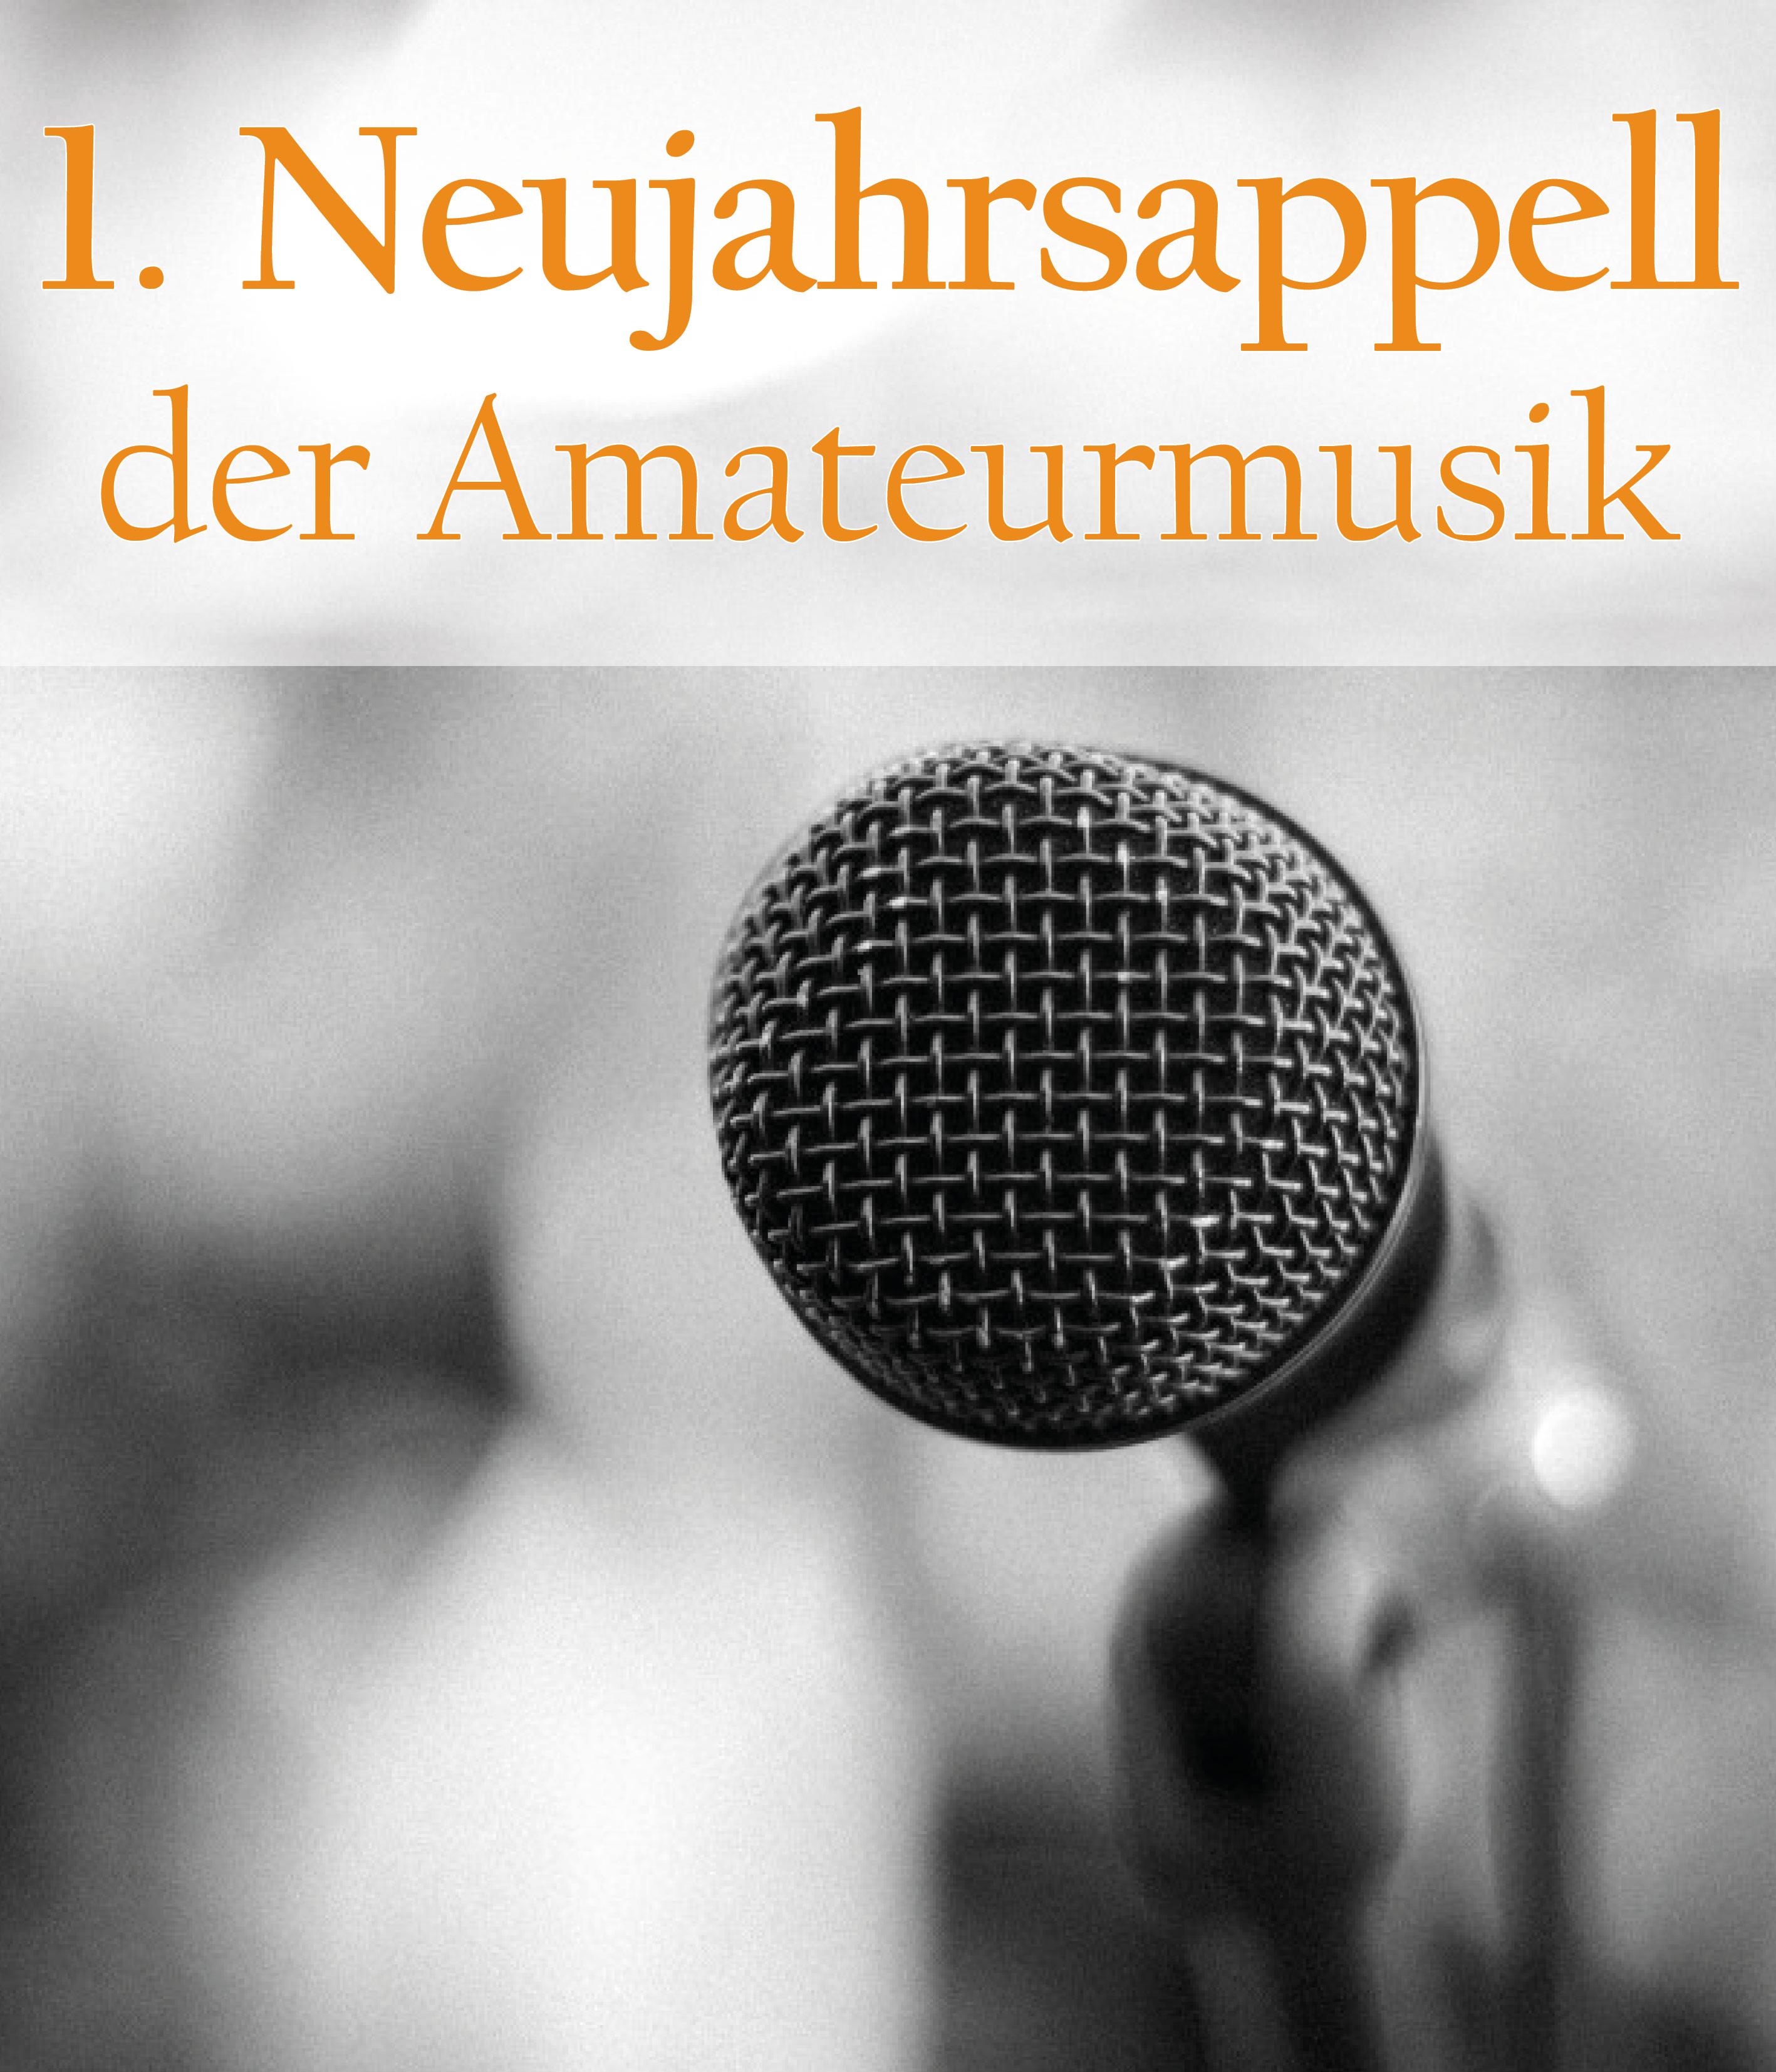 1. Neujahrsappell der Amateurmusik